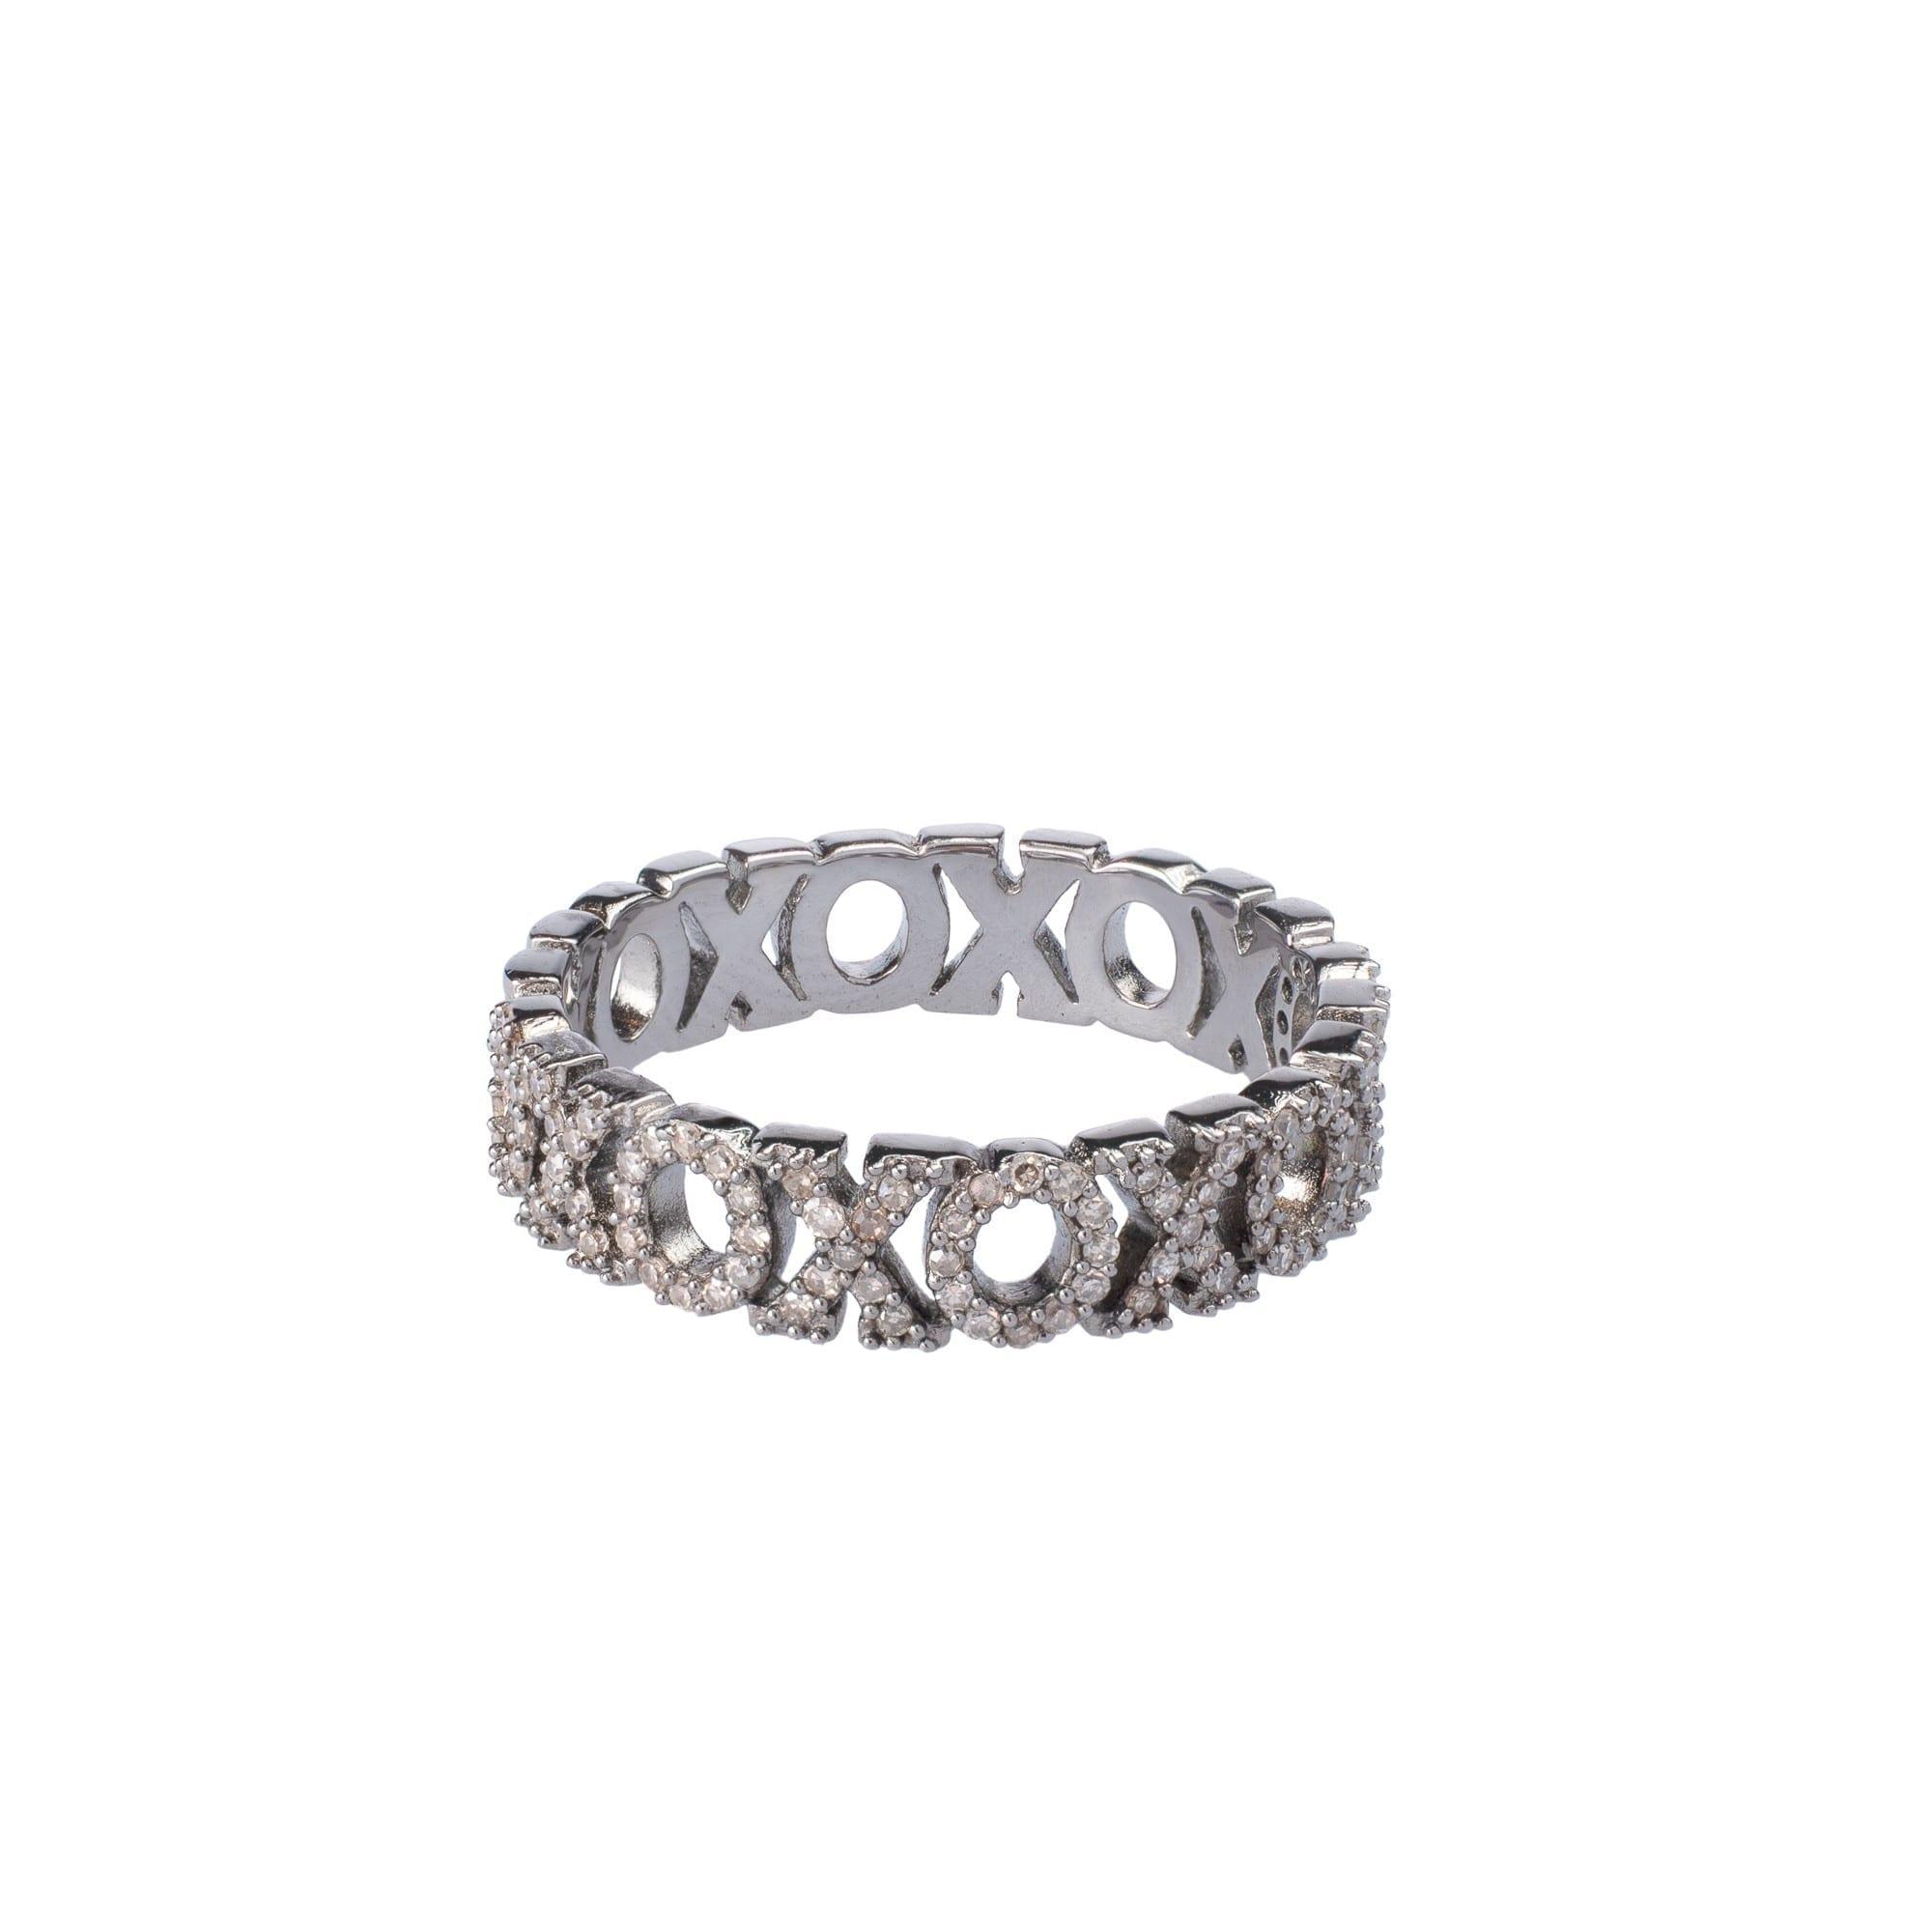 "Diamond ""XOXO"" Stacking Ring"